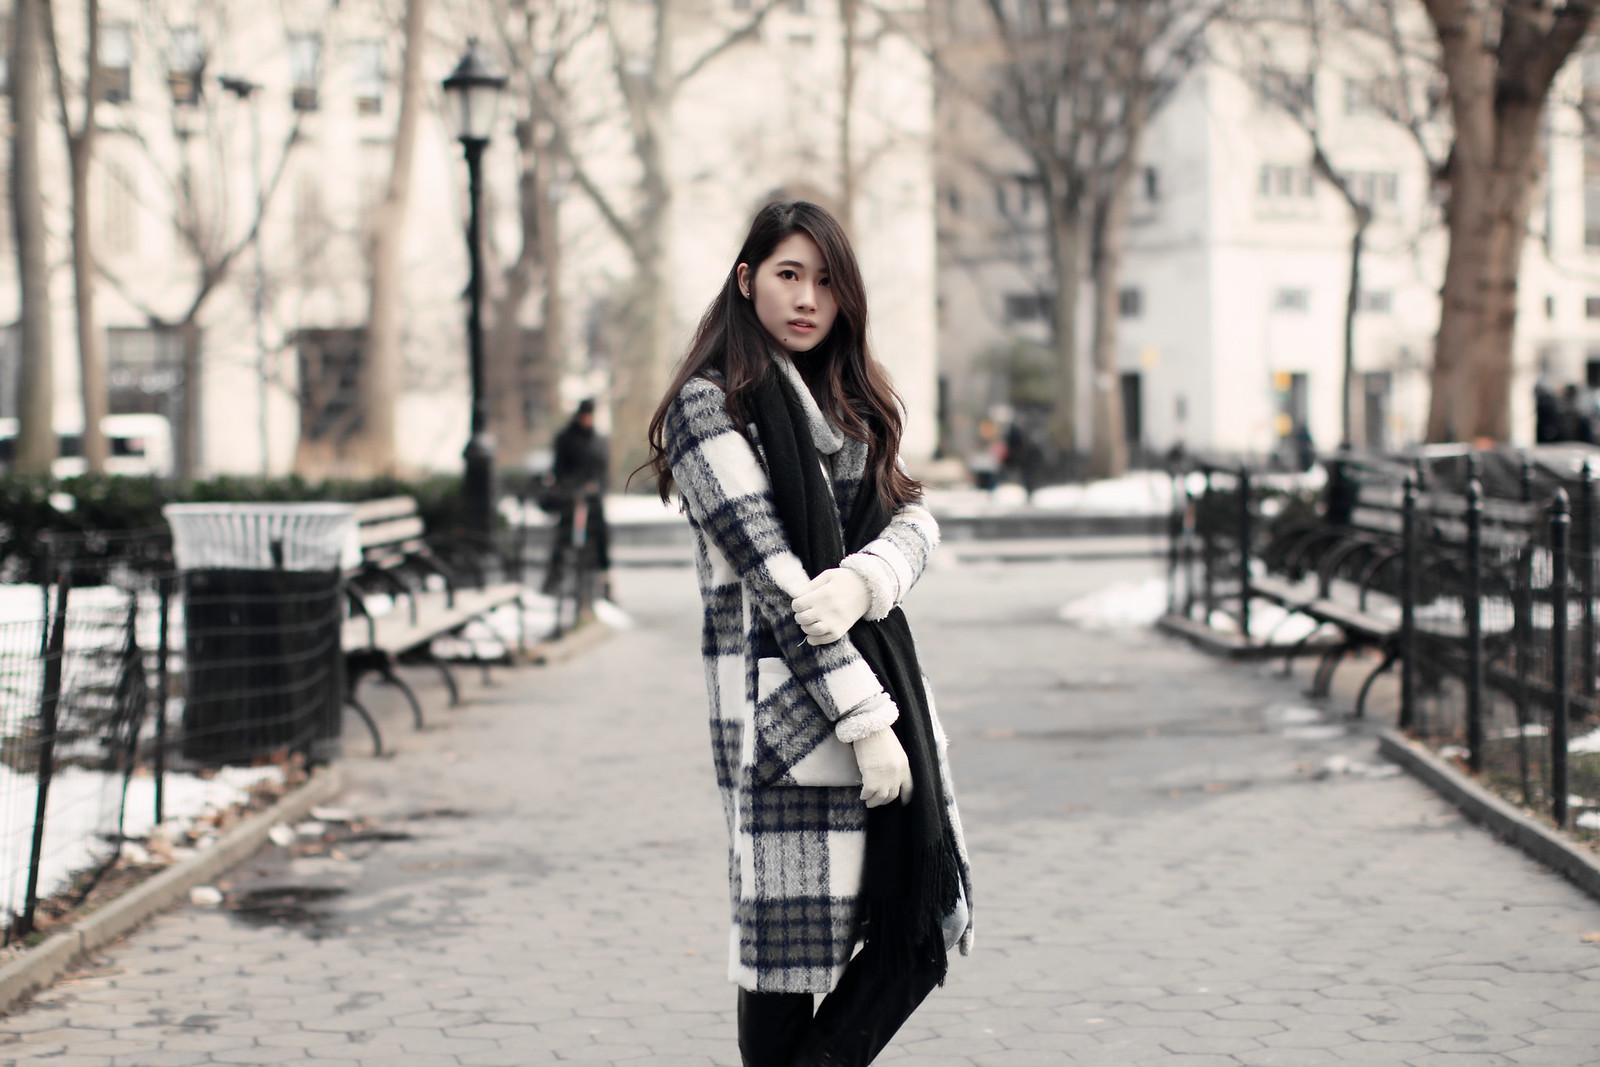 2087-clothestoyouuu-elizabeeetht-nyfw-newyorkfashionweek-nyc-fashionweek-newyork- winter2017-fashion-ootd本